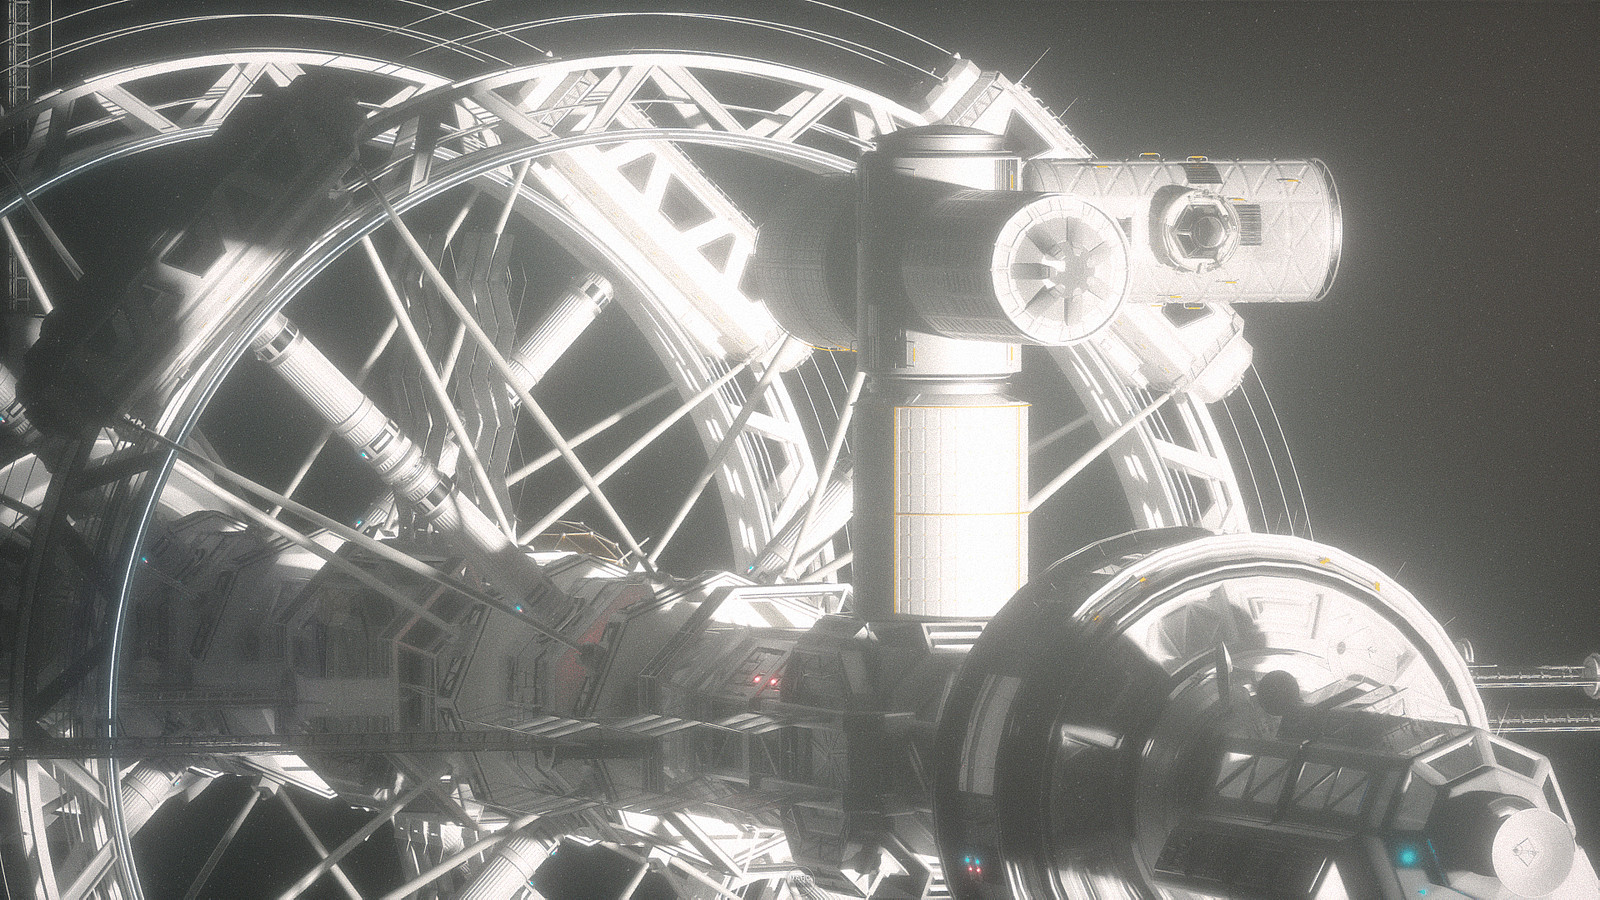 Daybreak Spaceship